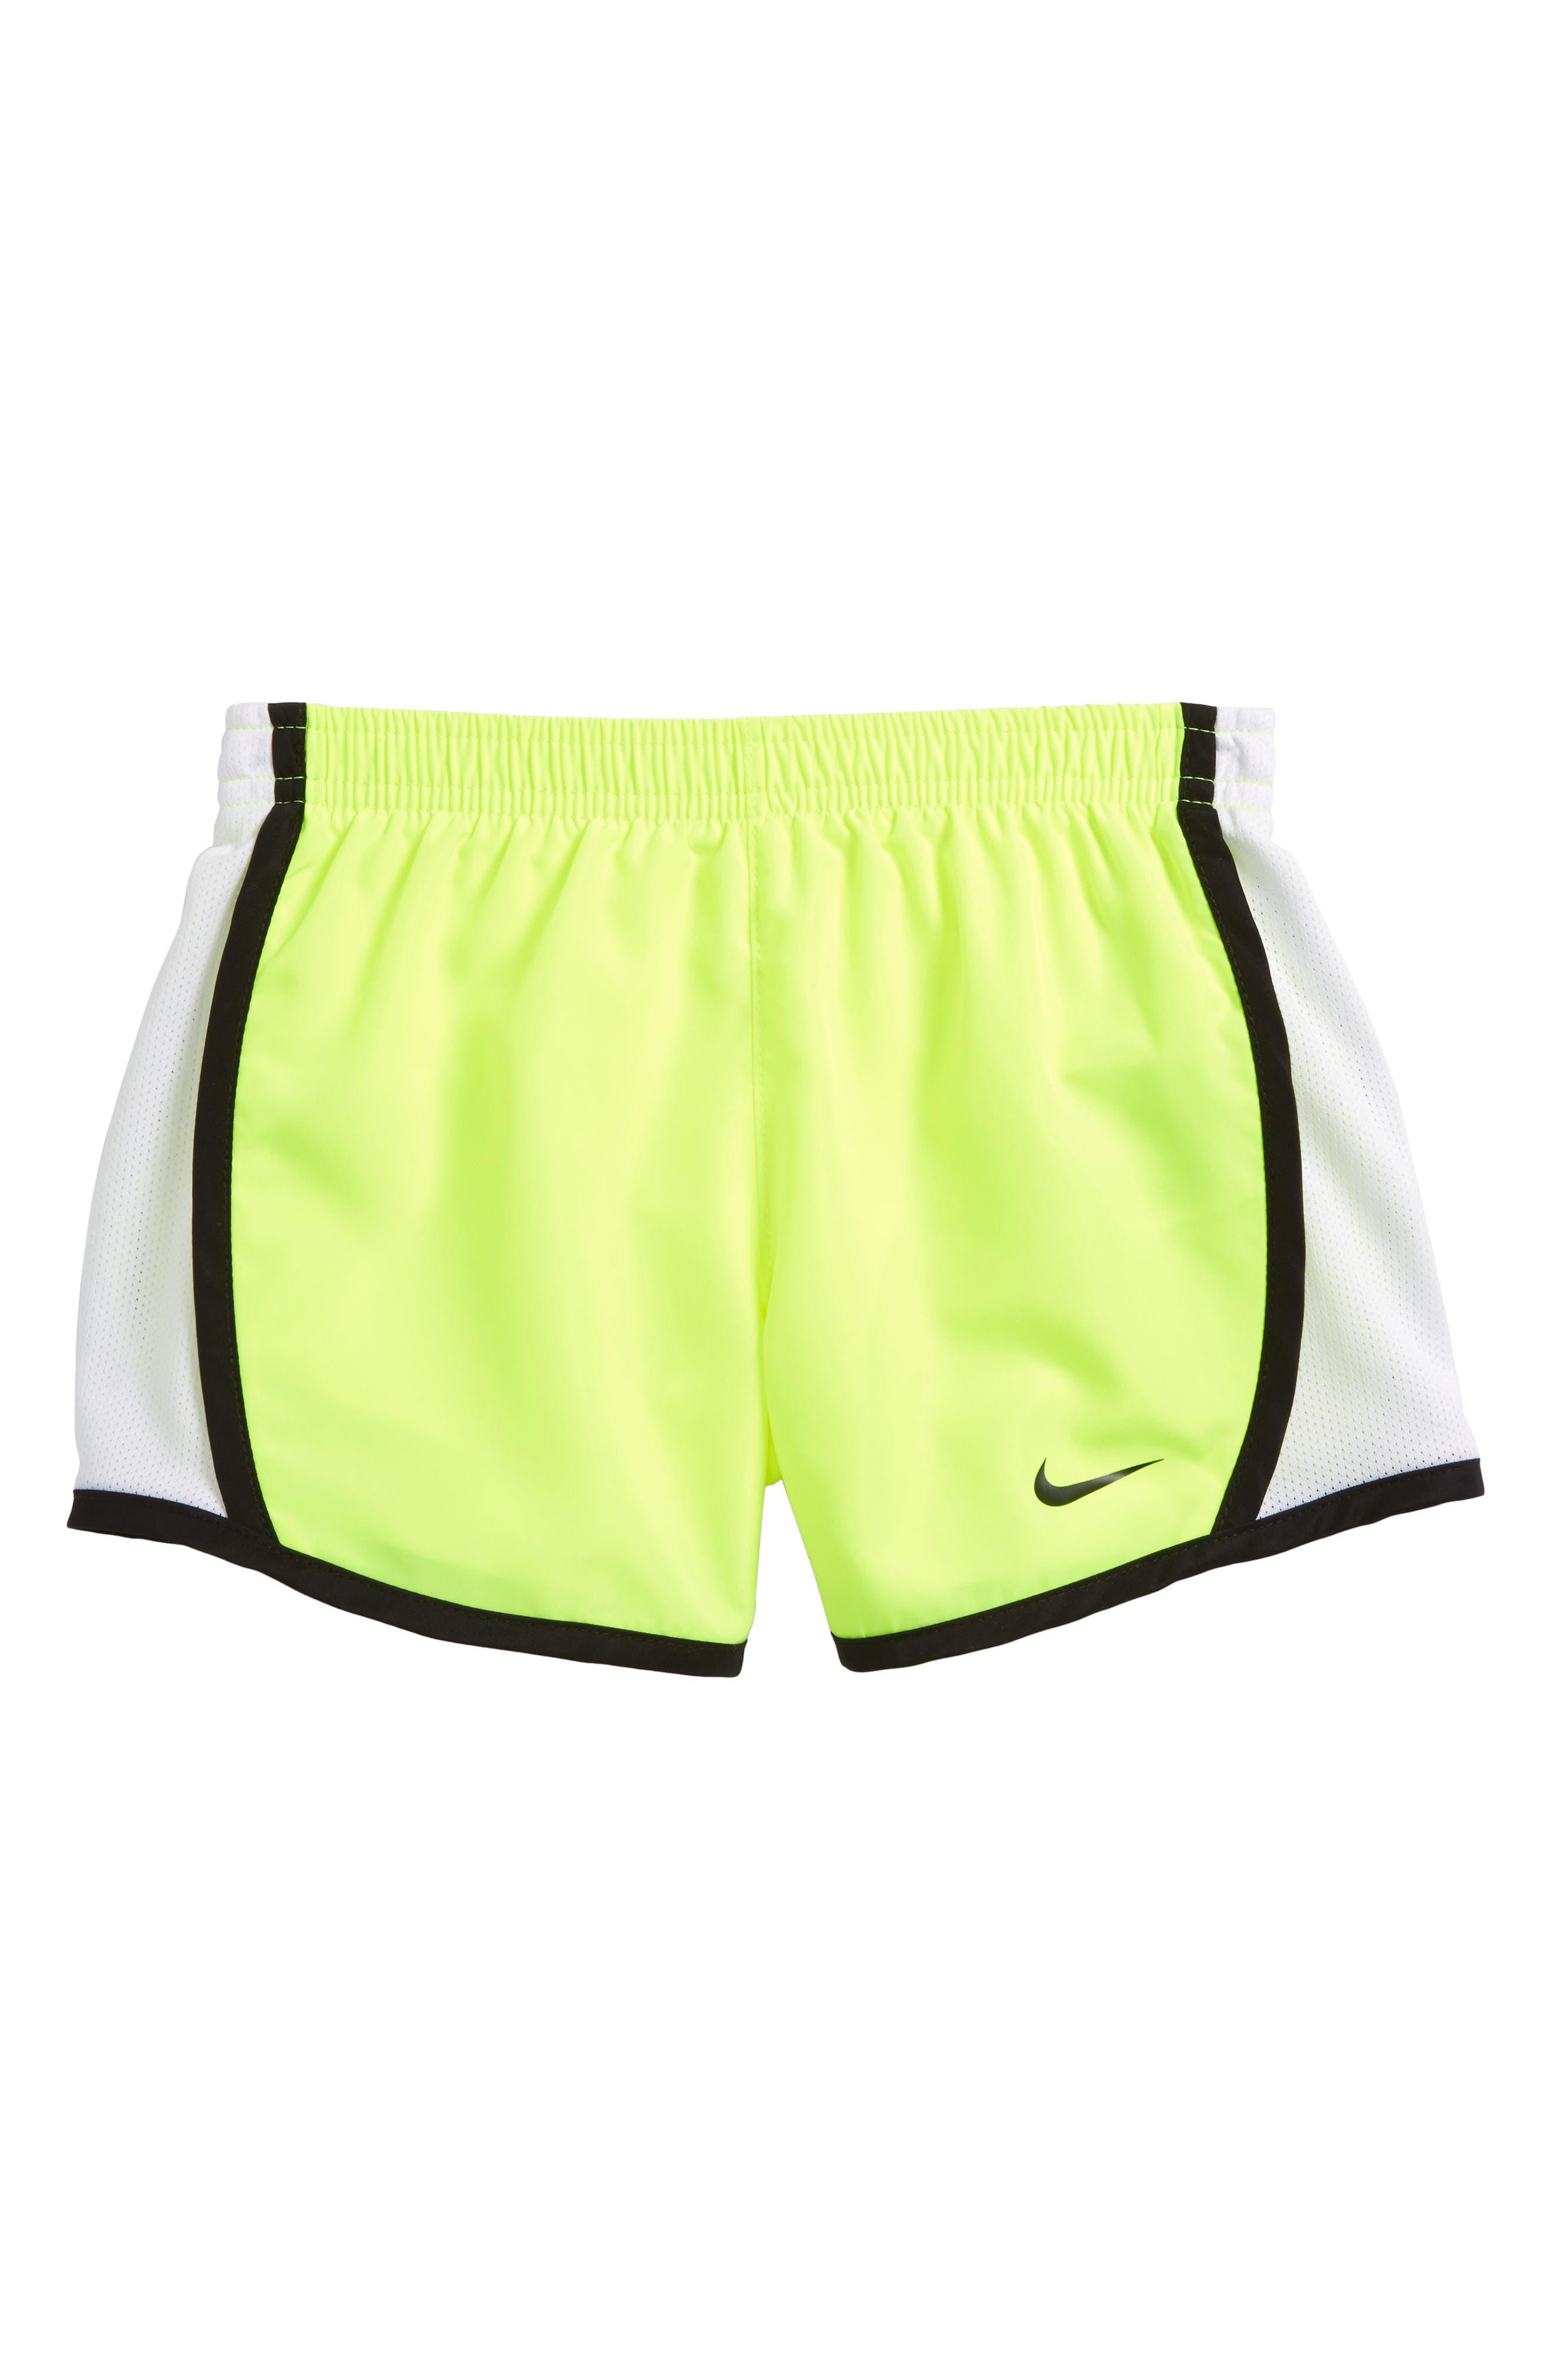 'Tempo' Dri-FIT Athletic Shorts,                         Main,                         color, 300